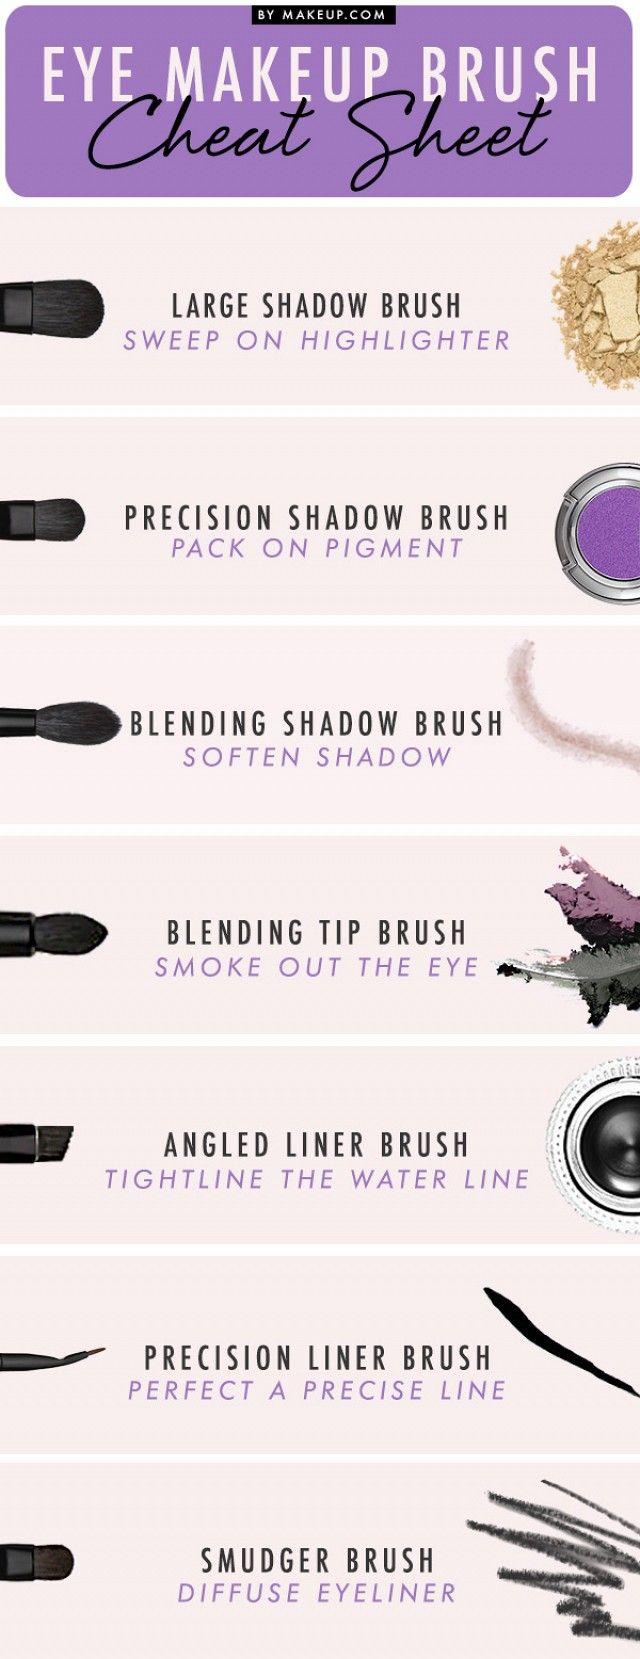 The Foolproof Eye Makeup Brush Guide